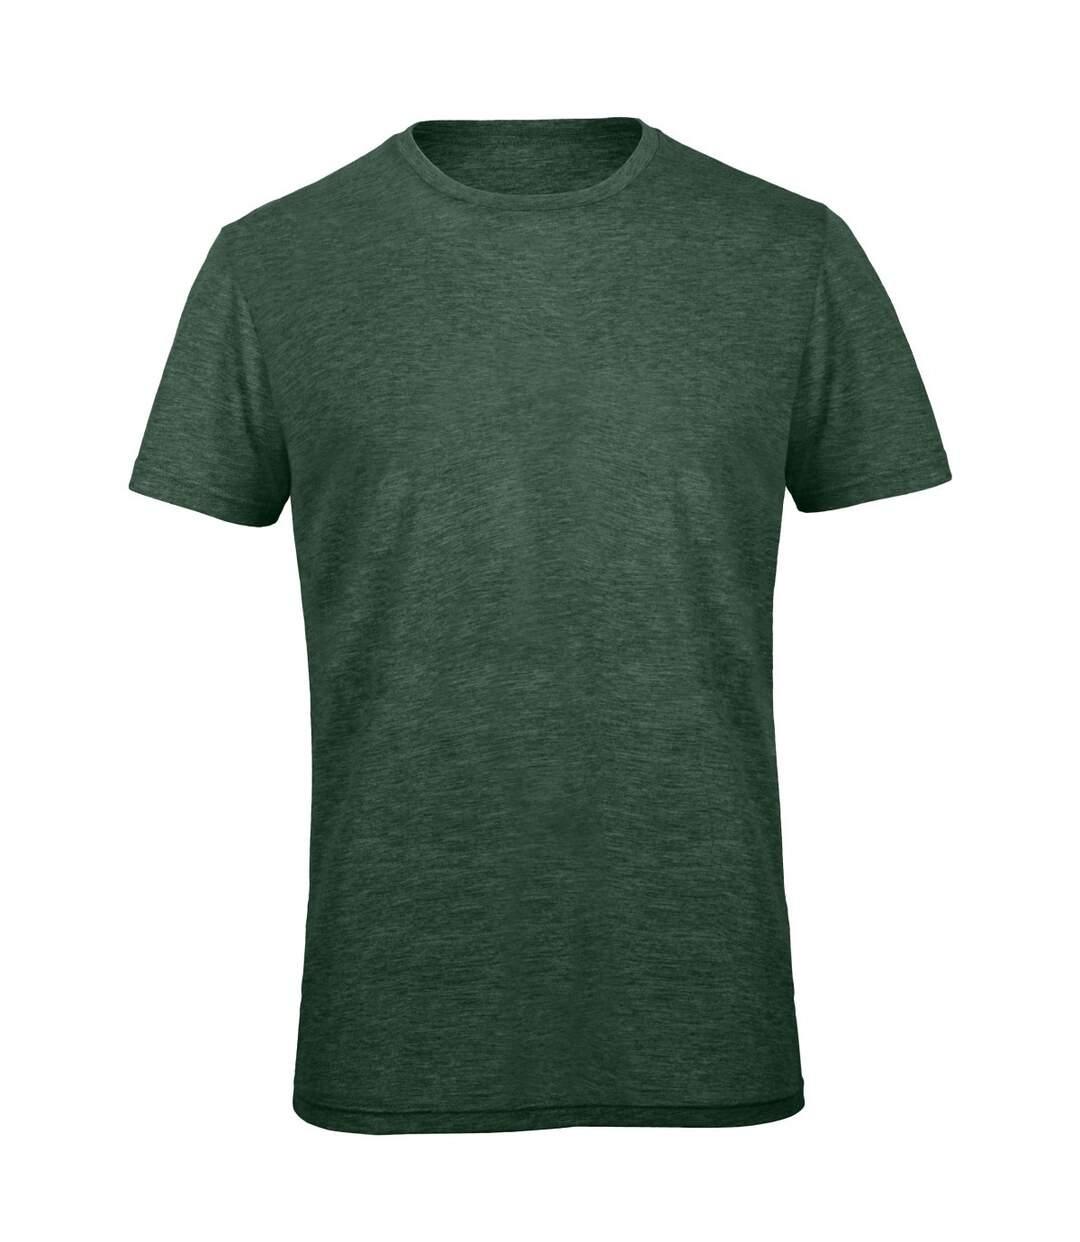 B&C Mens Favourite Short Sleeve Triblend T-Shirt (Heather Forest Green) - UTBC3638